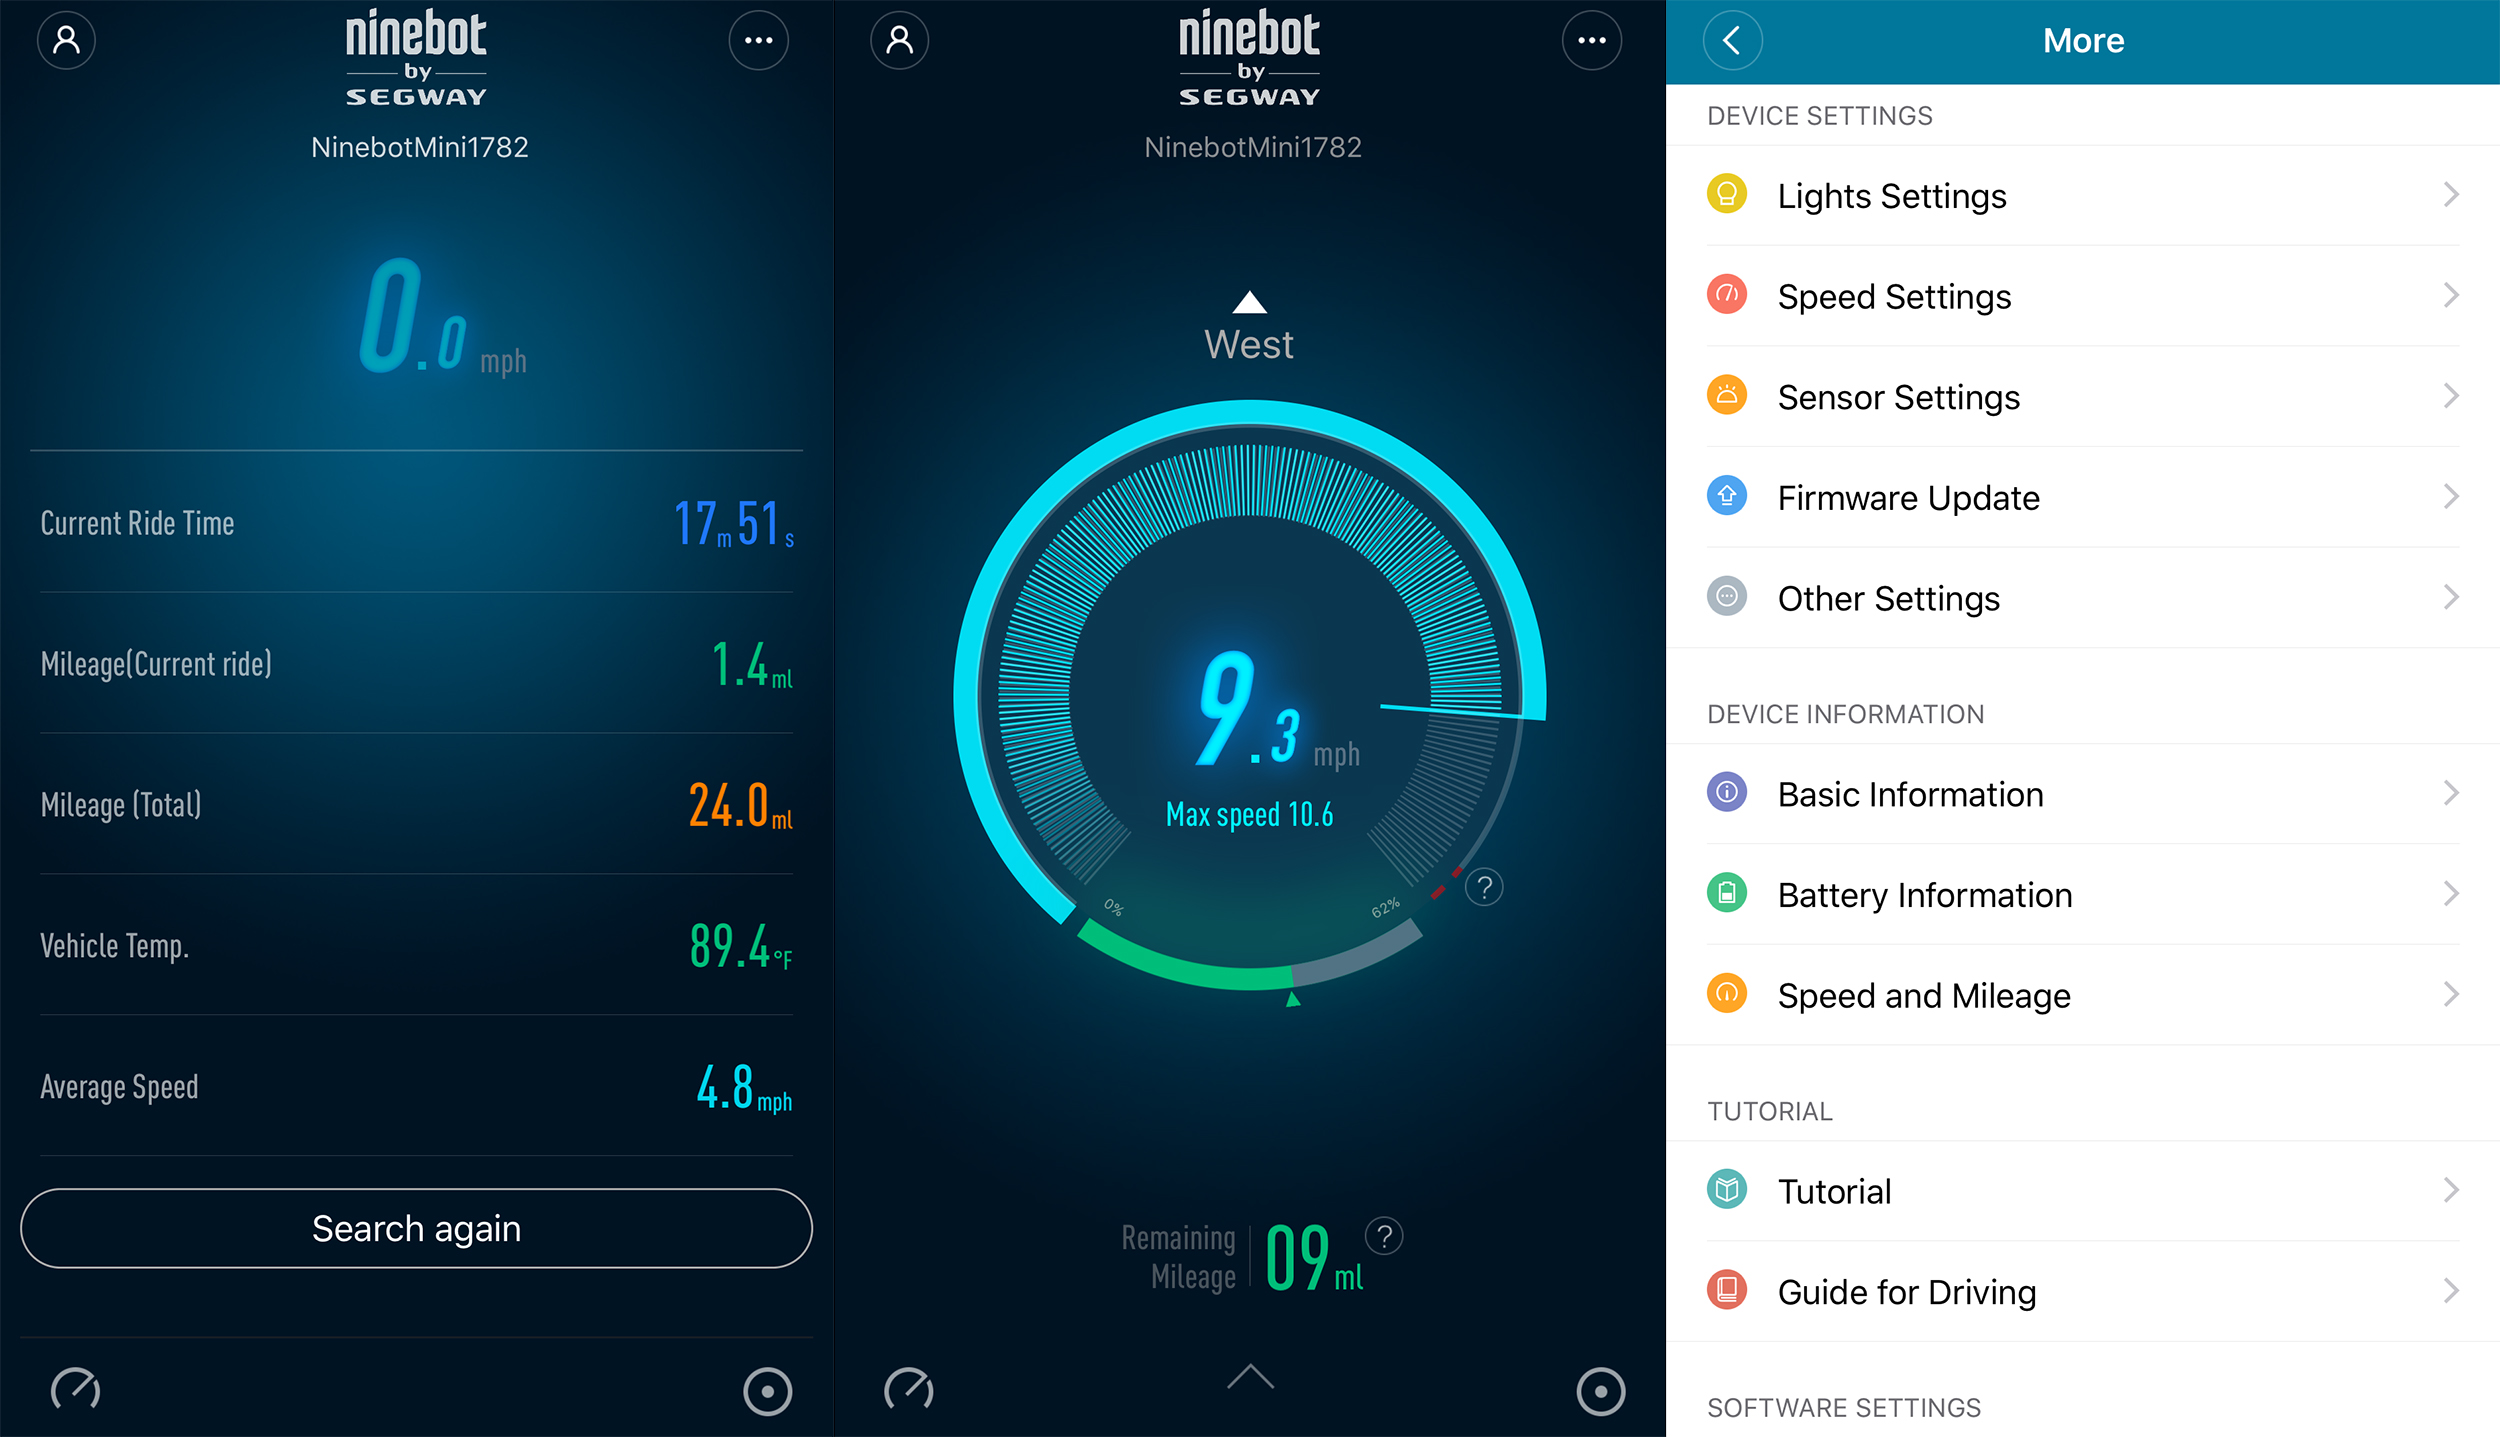 segway-ninebot-minipro-app.jpg